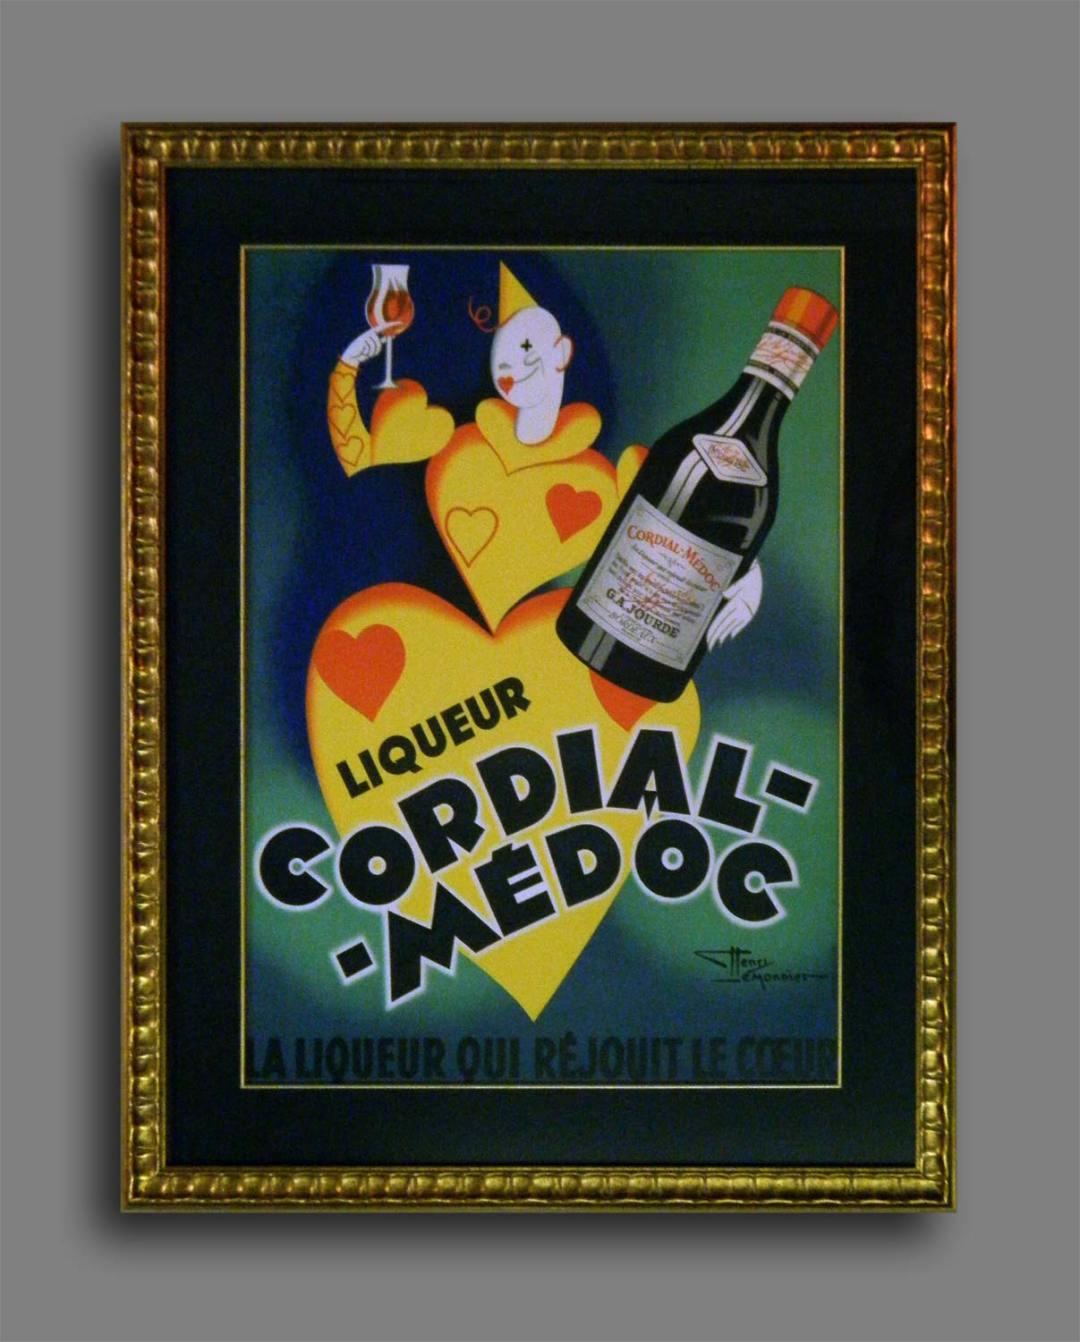 Cordial Medoc Advertising